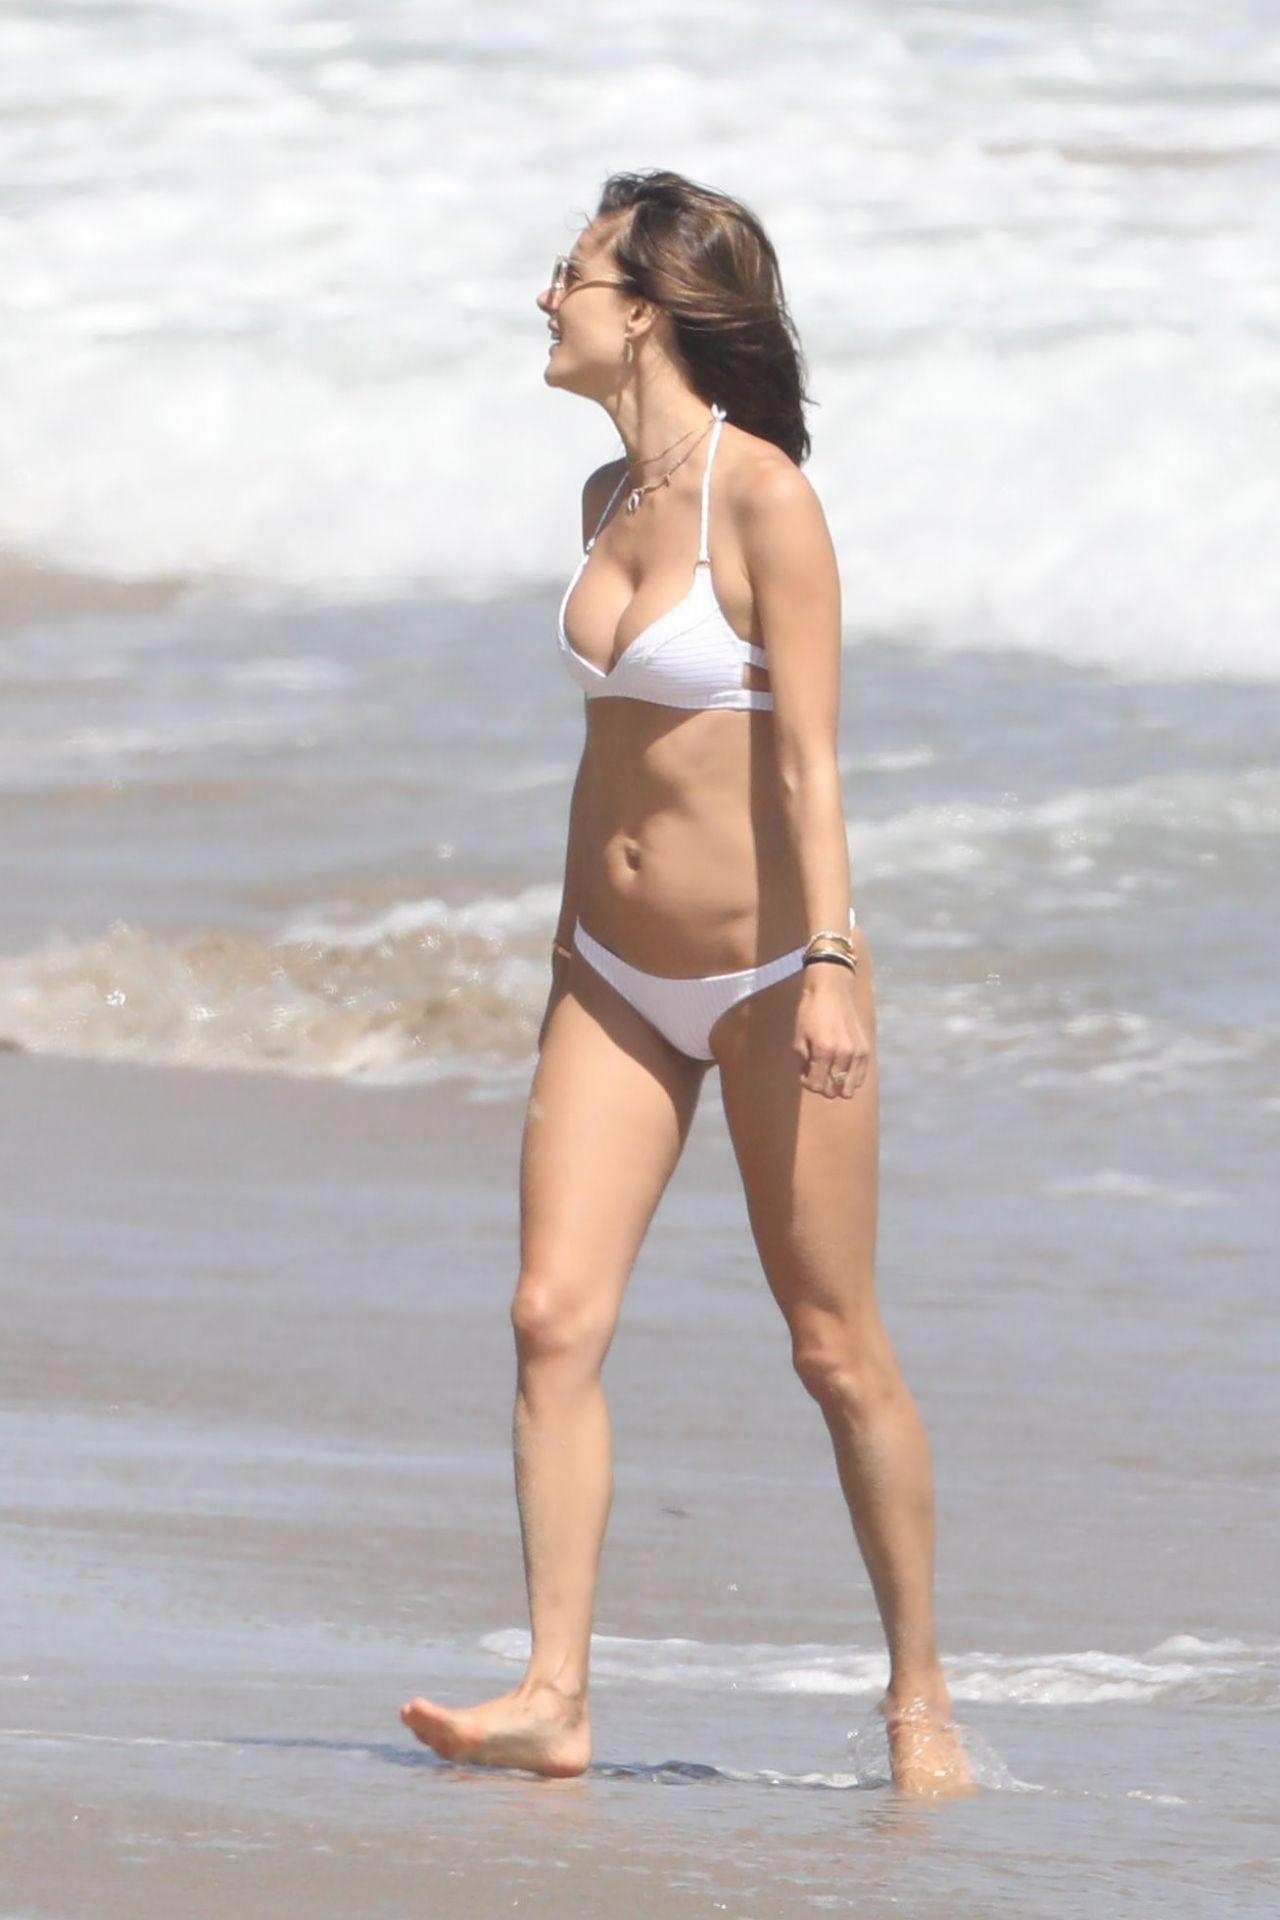 Alessandra Ambrosio Bikini Bodies Pic 31 of 35